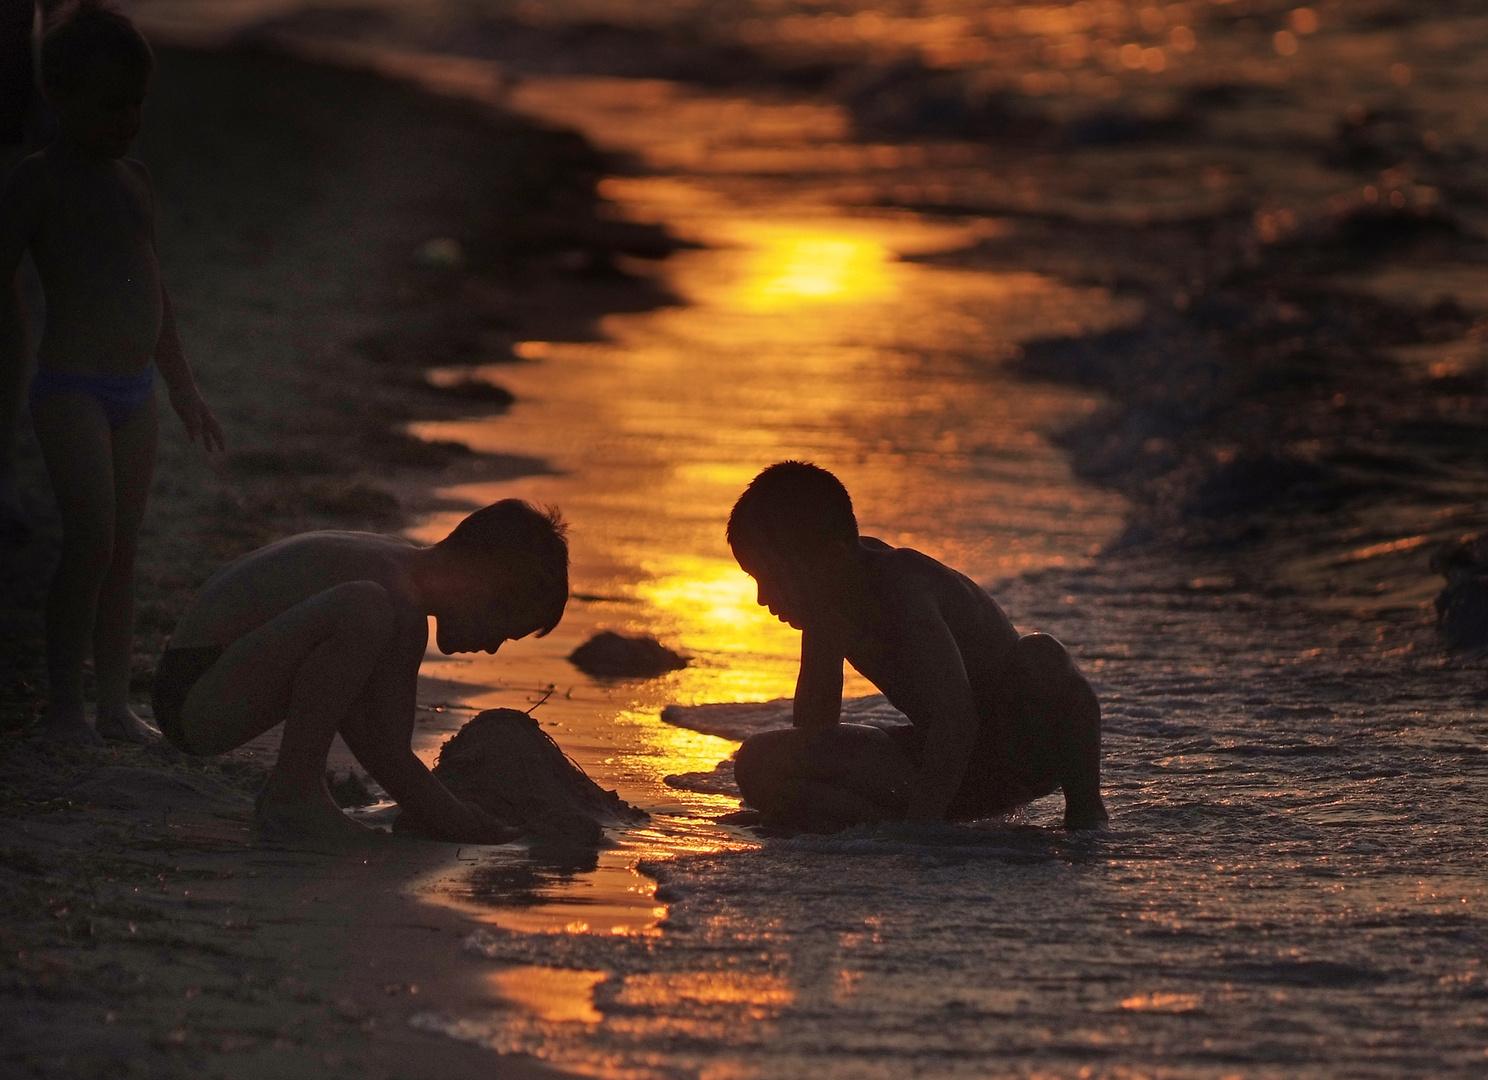 THE BEACH SANDPITS